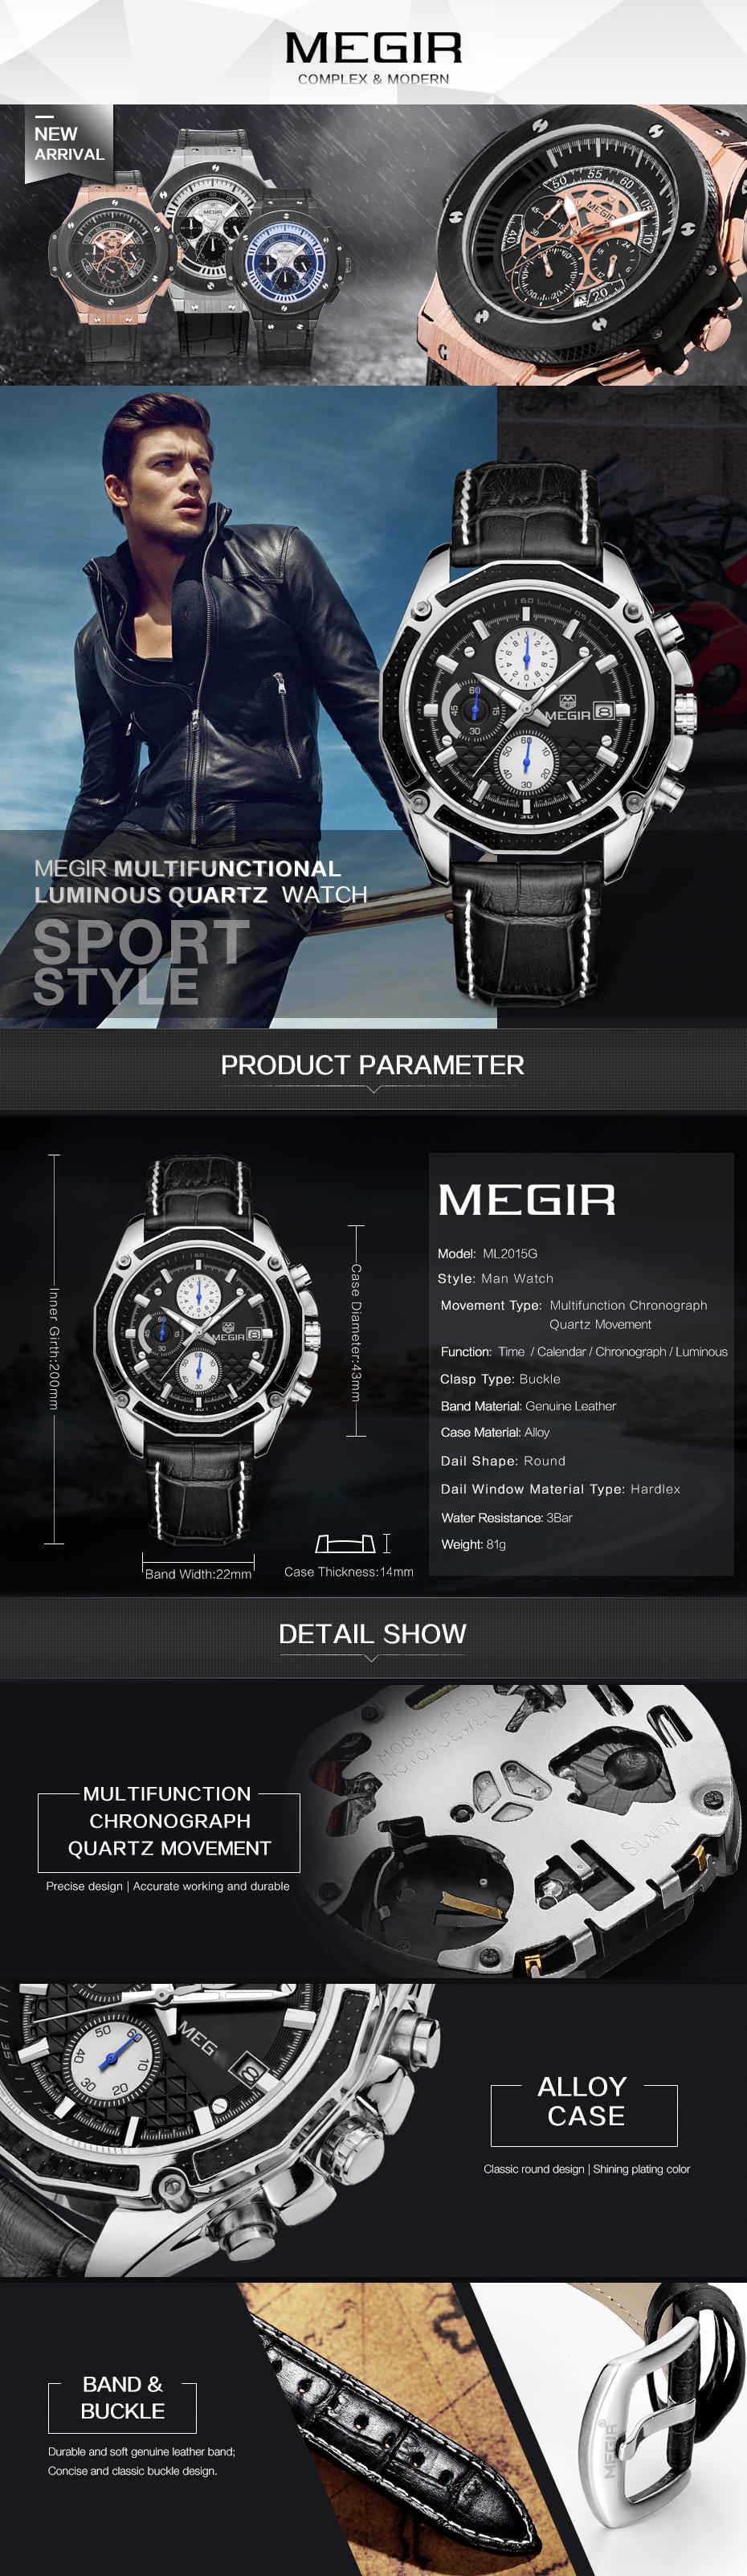 Genuine MEGIR quartz male watches Genuine Leather watches racing men Students game Run Chronograph Watch male glow hands (5)